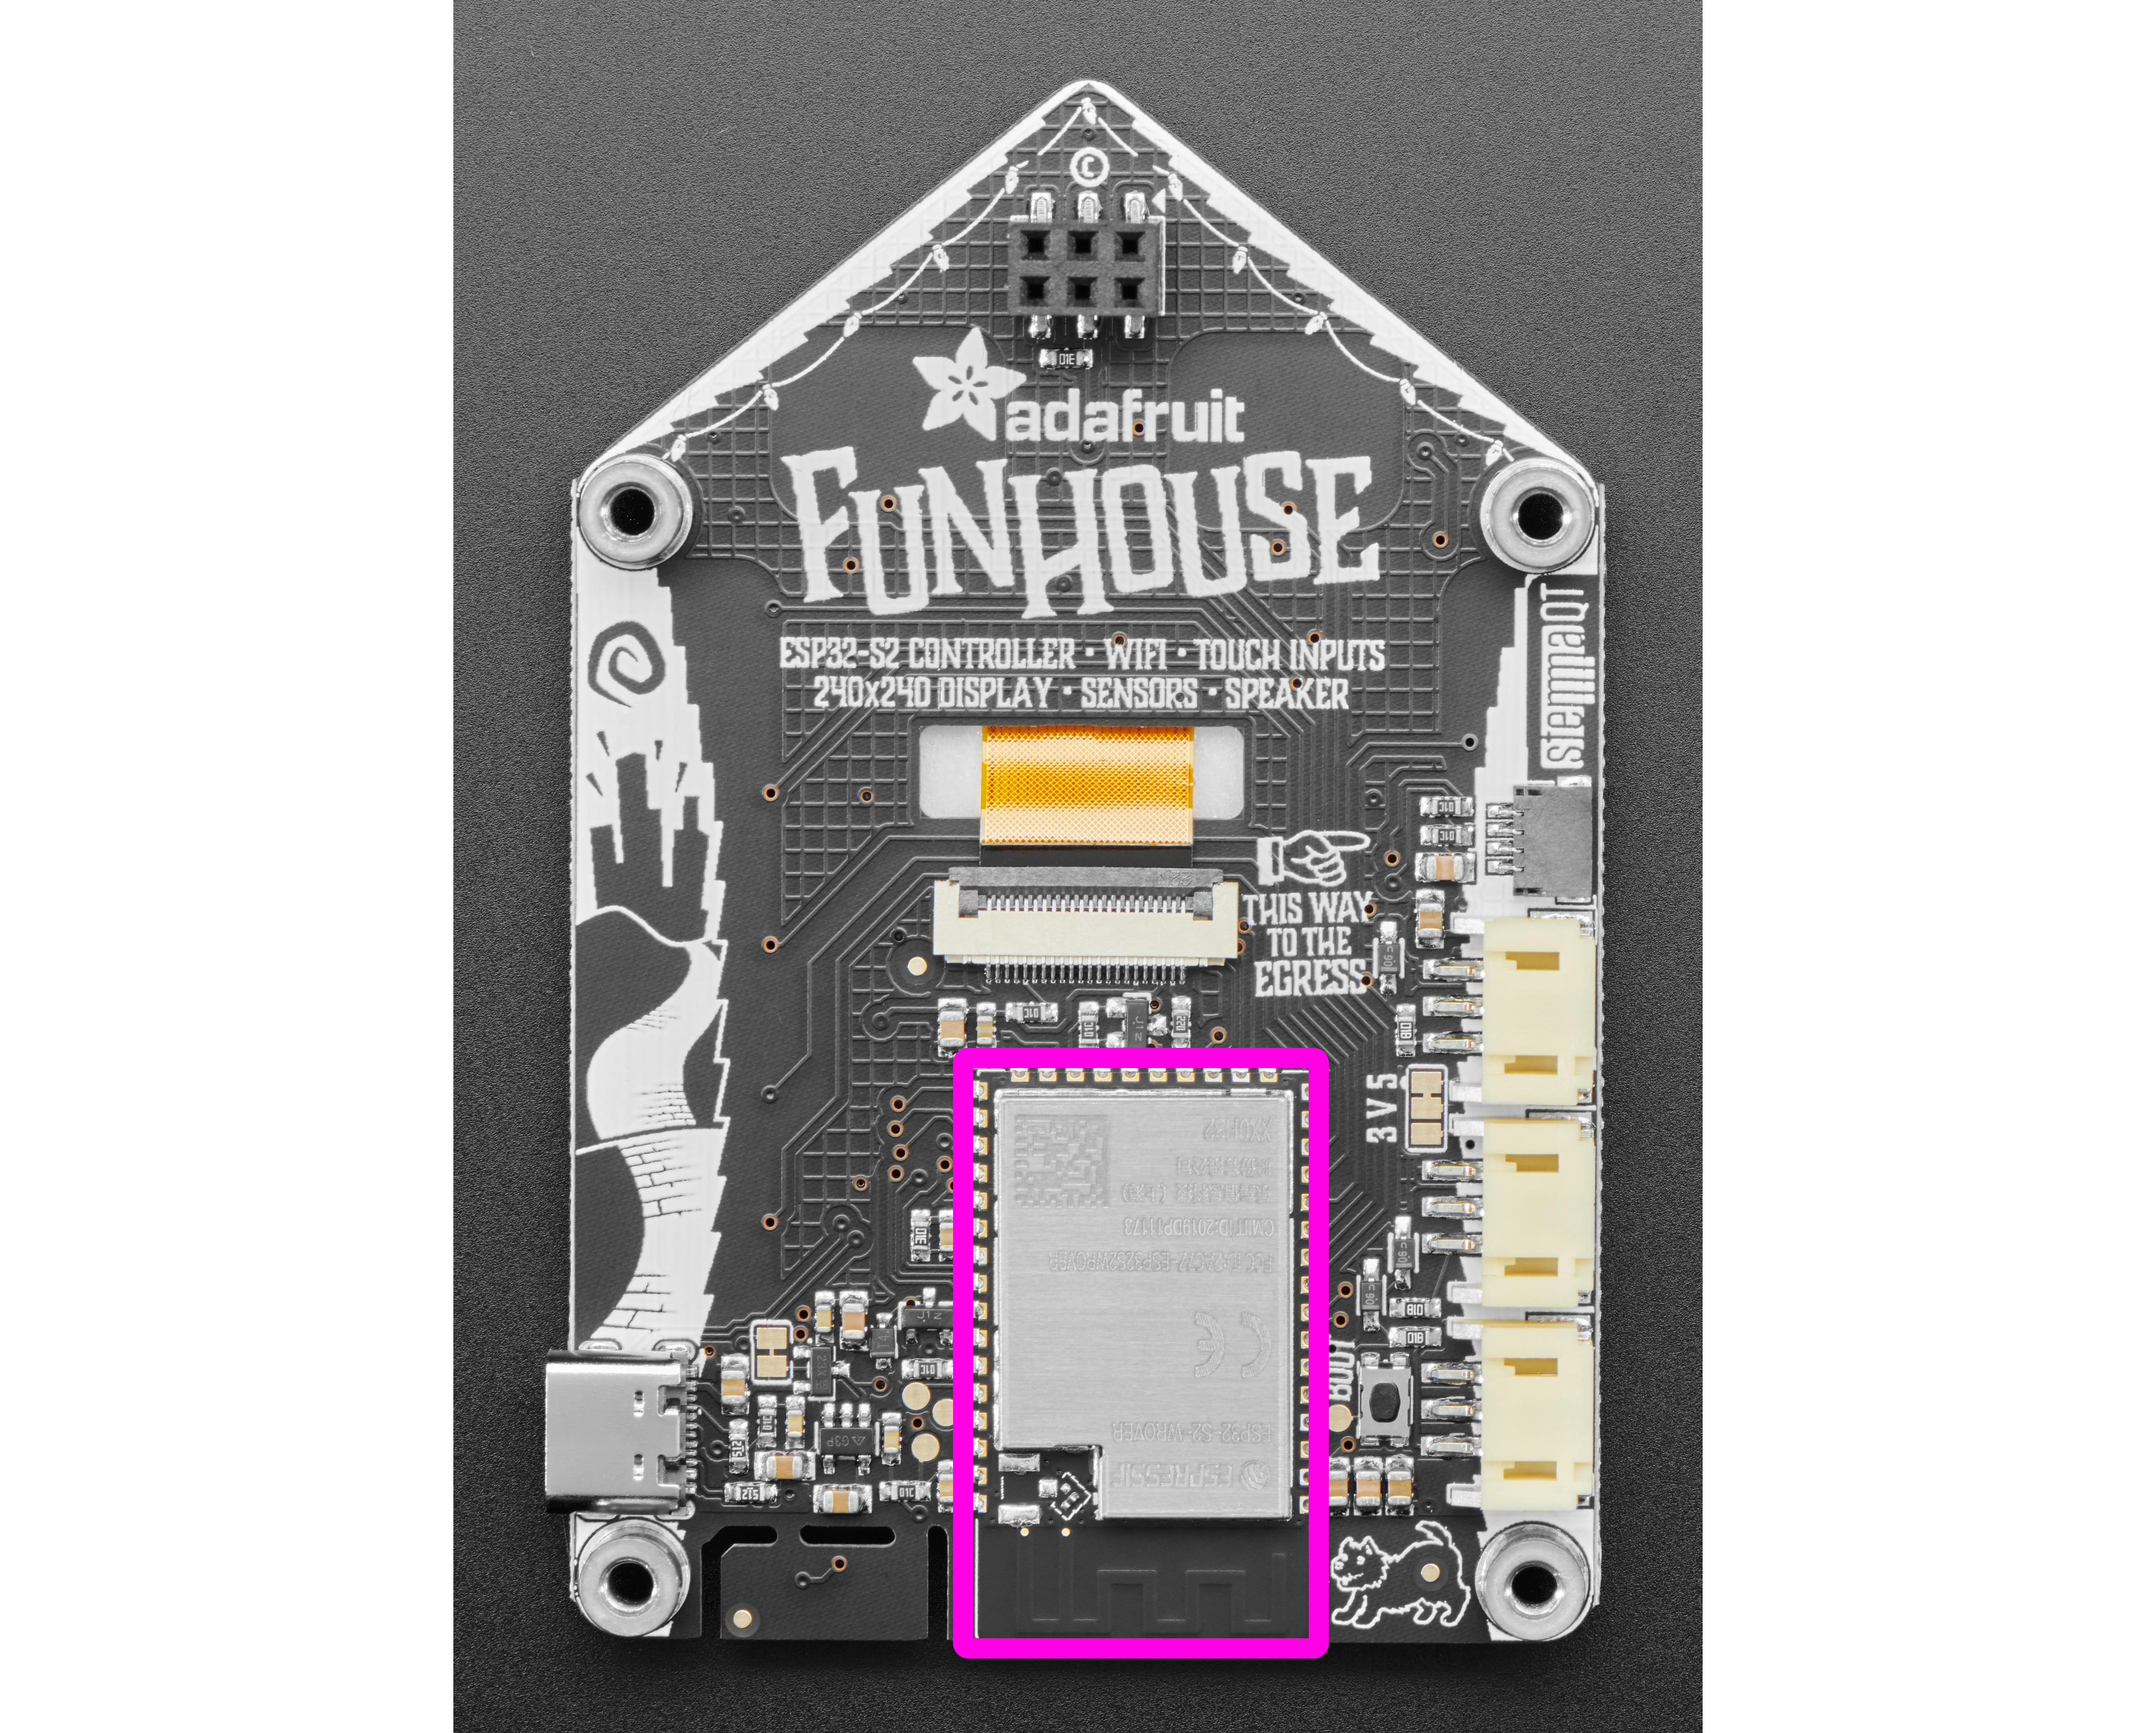 sensors_FunHouse_microcontroller.jpg